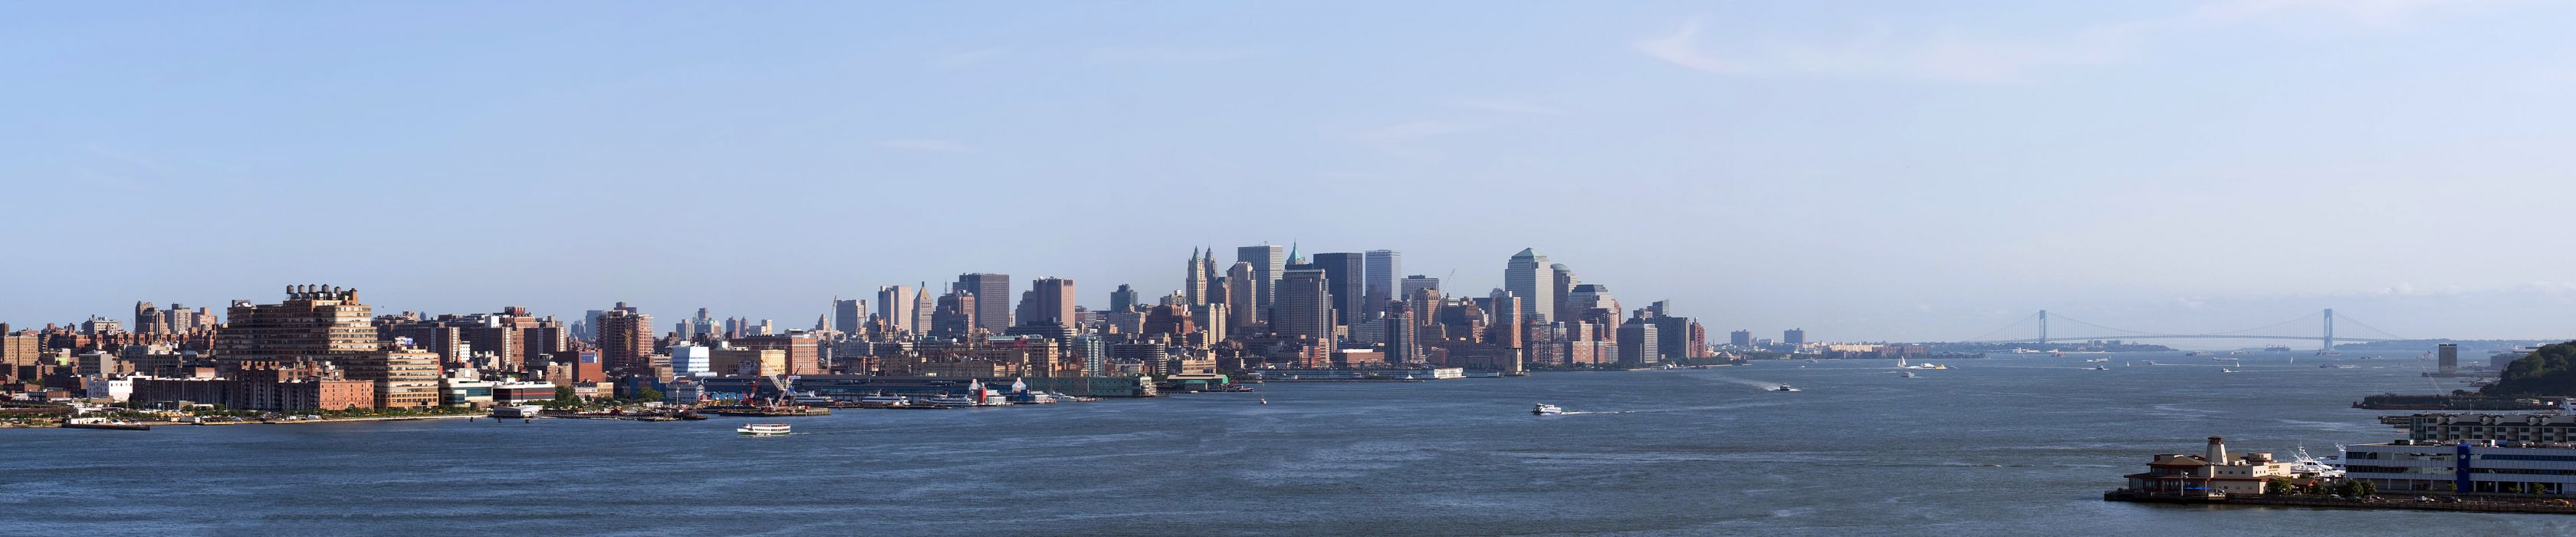 New York Hudson River bay     h wallpaper